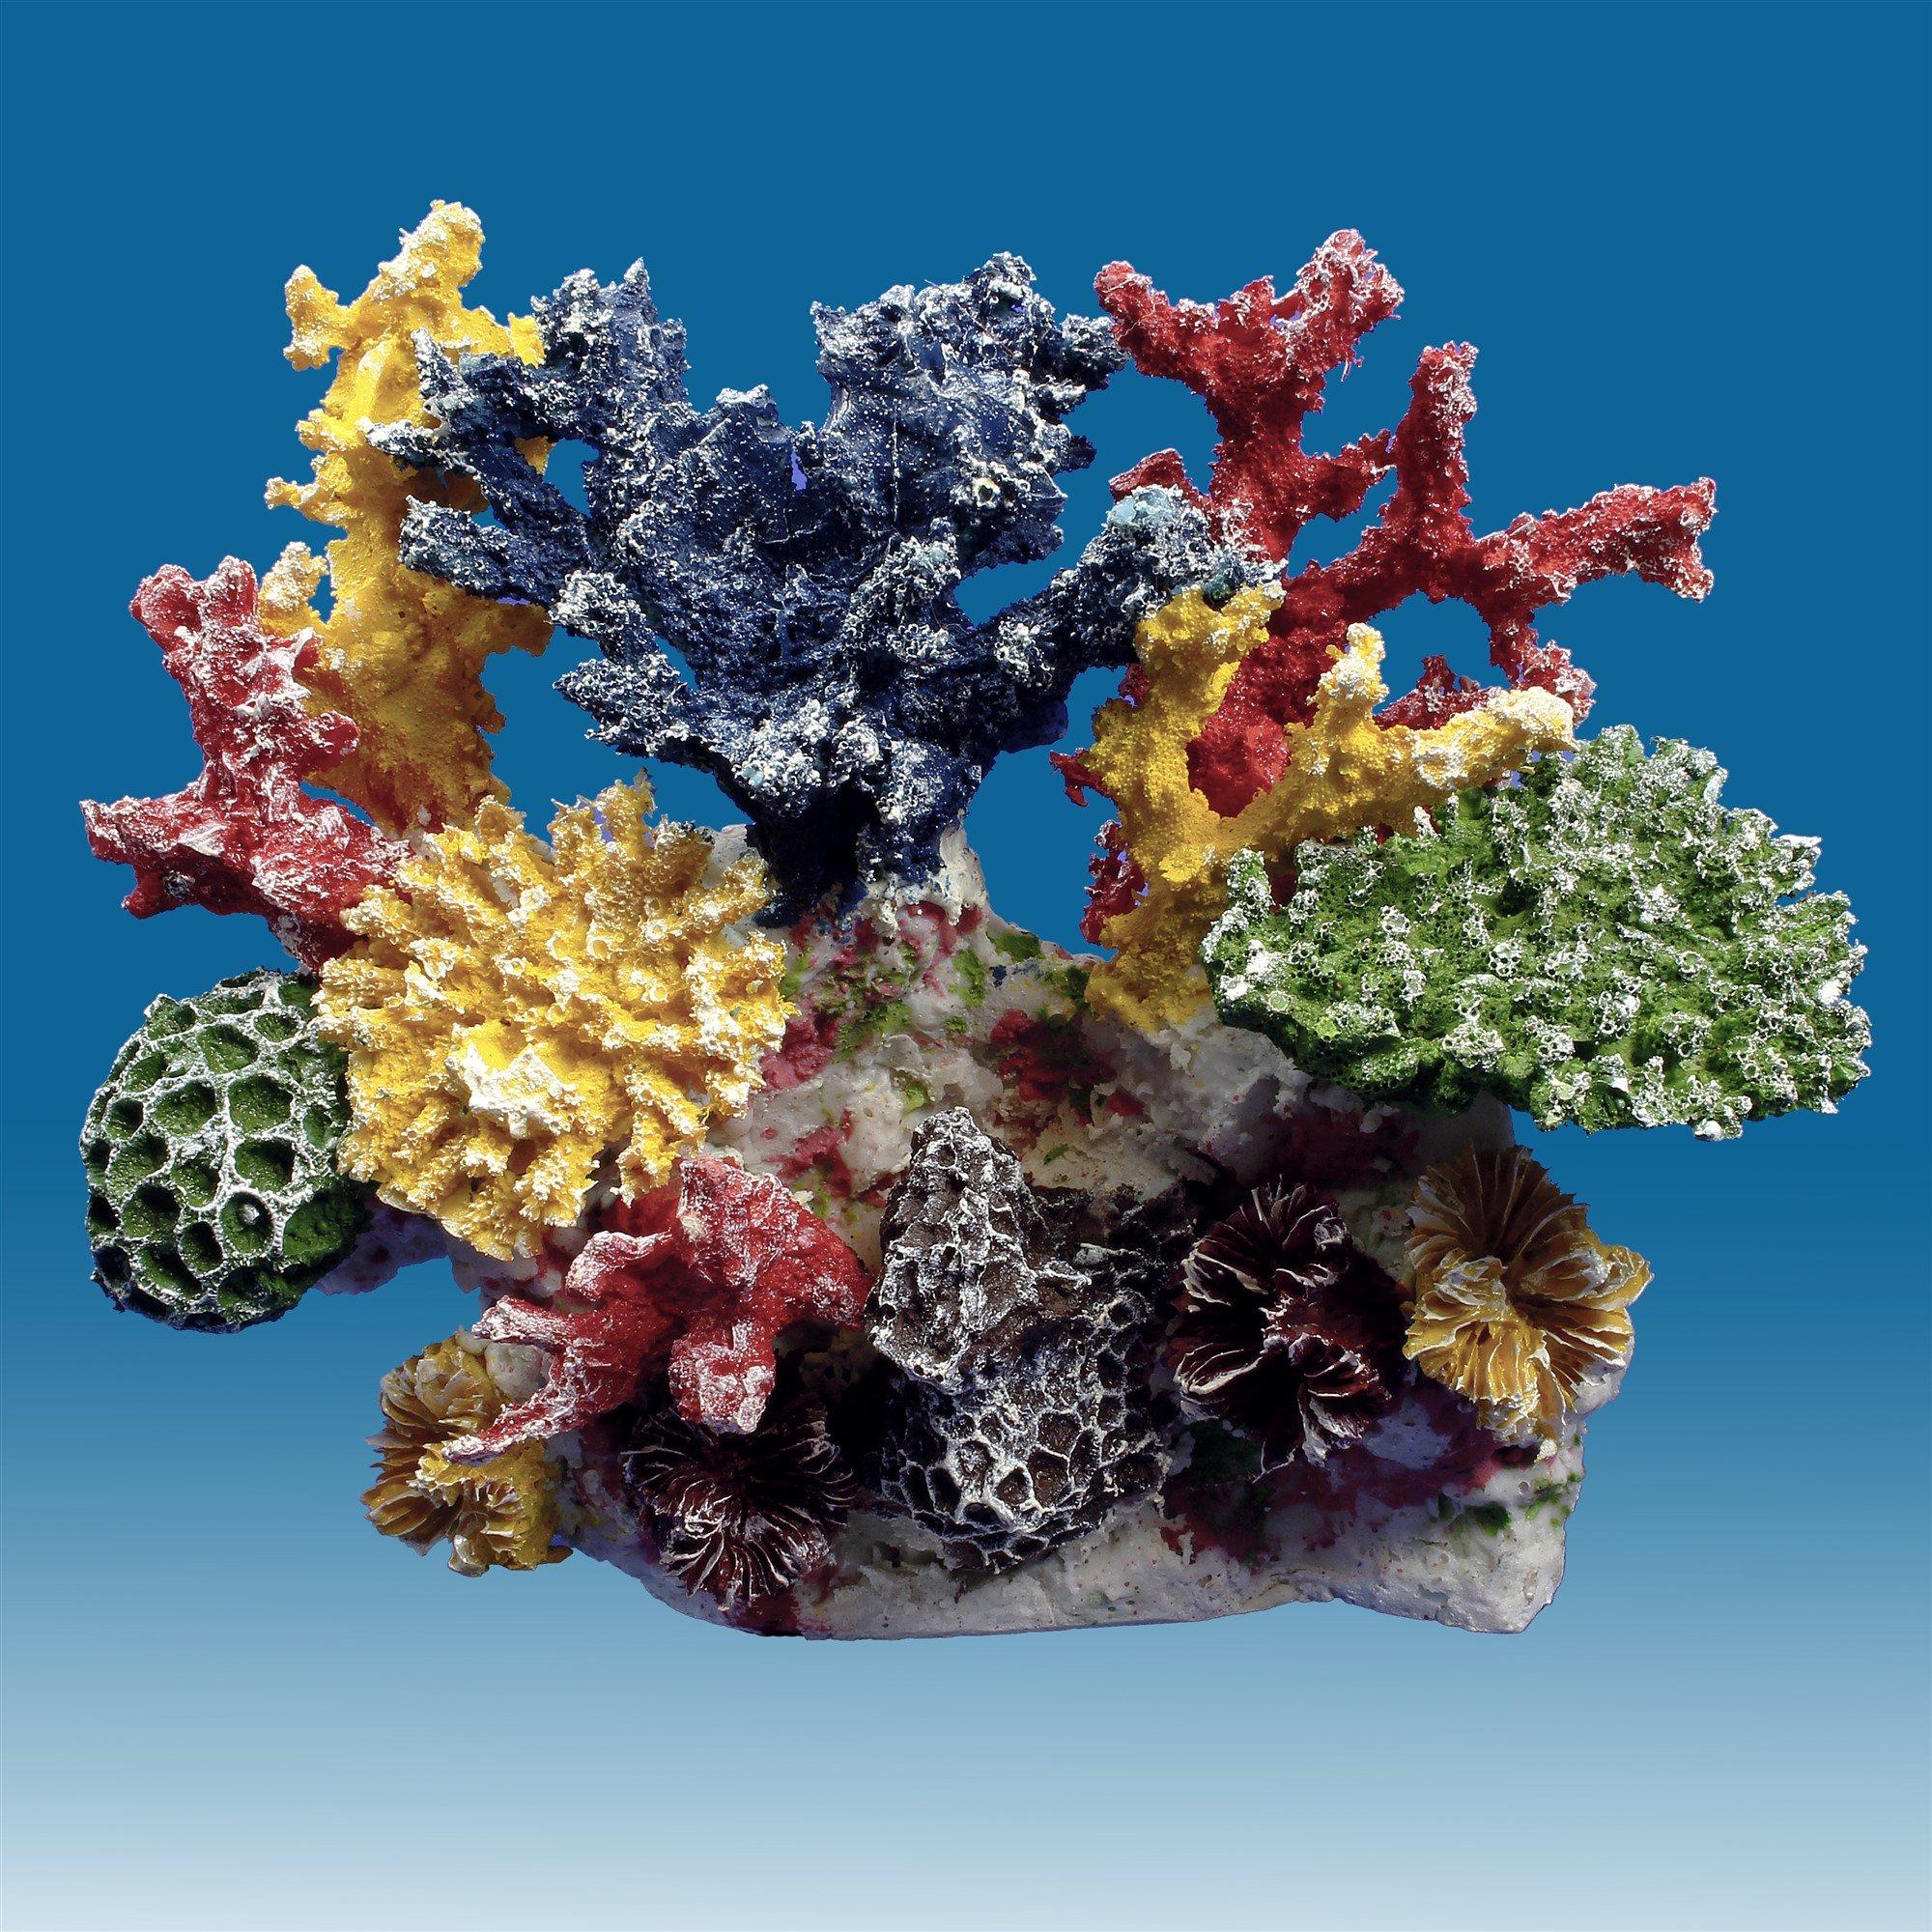 Instant Reef DM036 Artificial Coral Reef Aquarium Decor for Saltwater Fish, Marine Fish Tanks and Freshwater Fish Aquariums